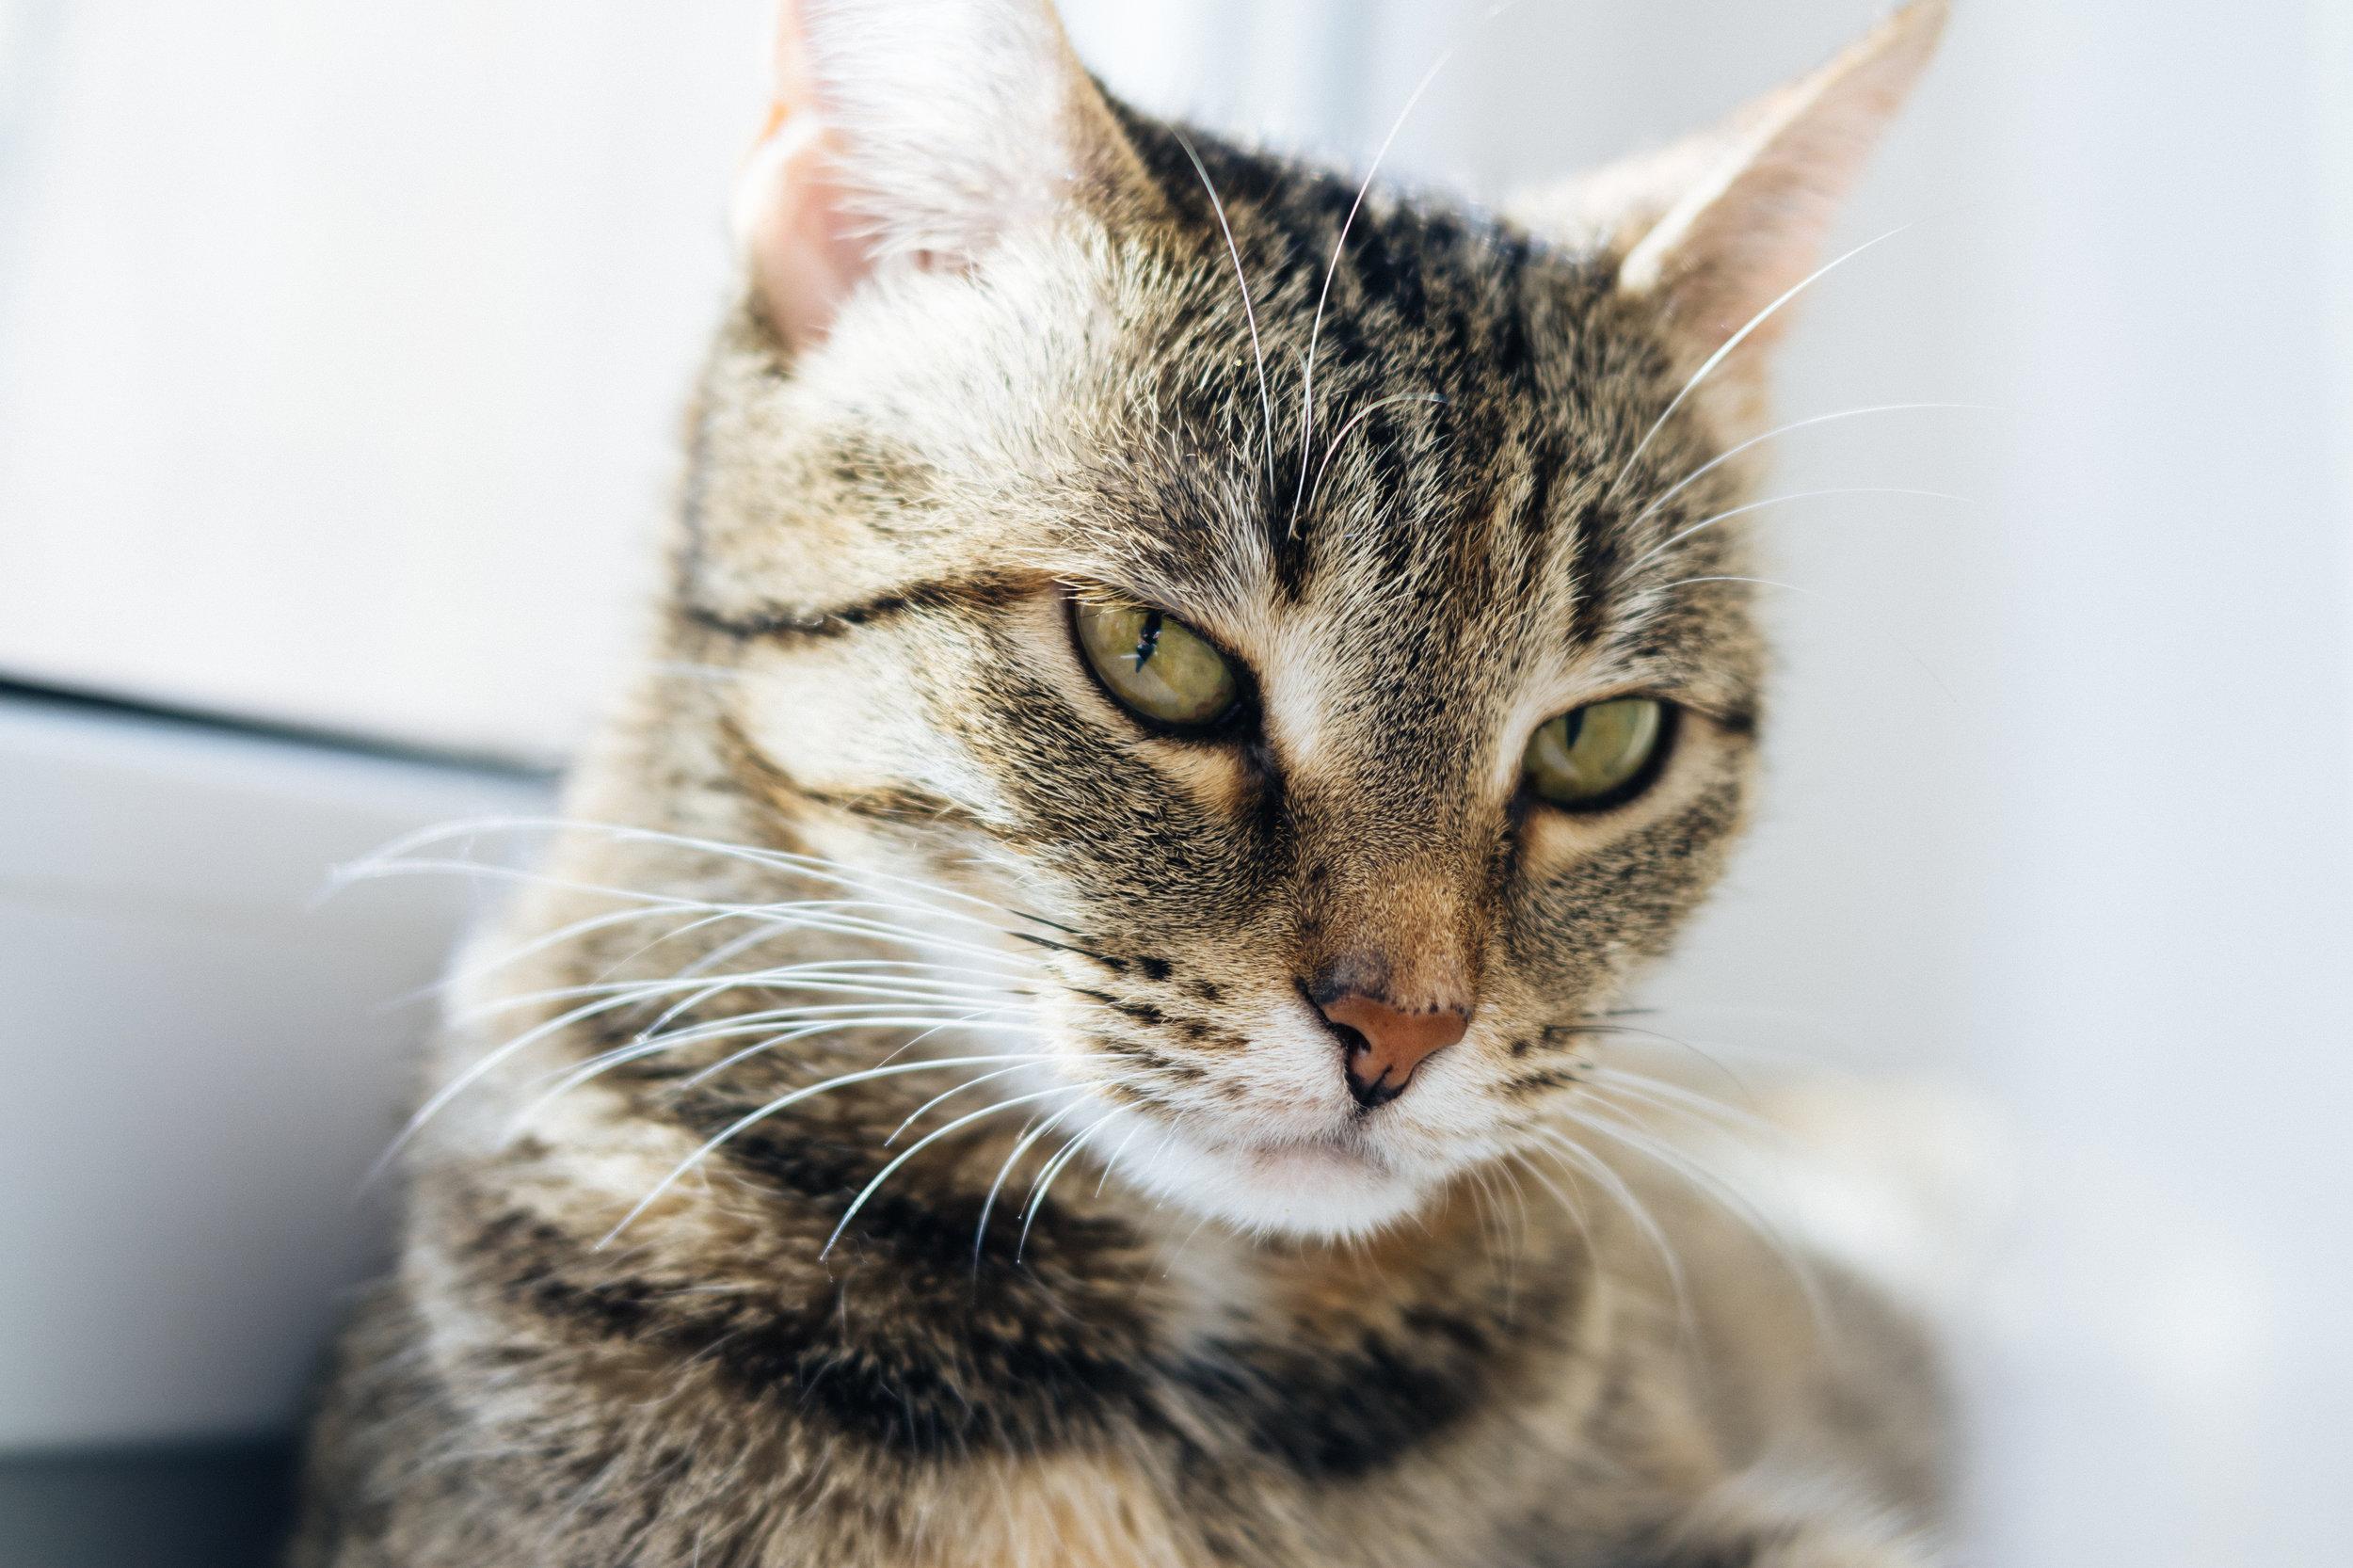 graphicstock-light-portrait-of-a-cat-on-the-window_rW8g9_shw-.jpg